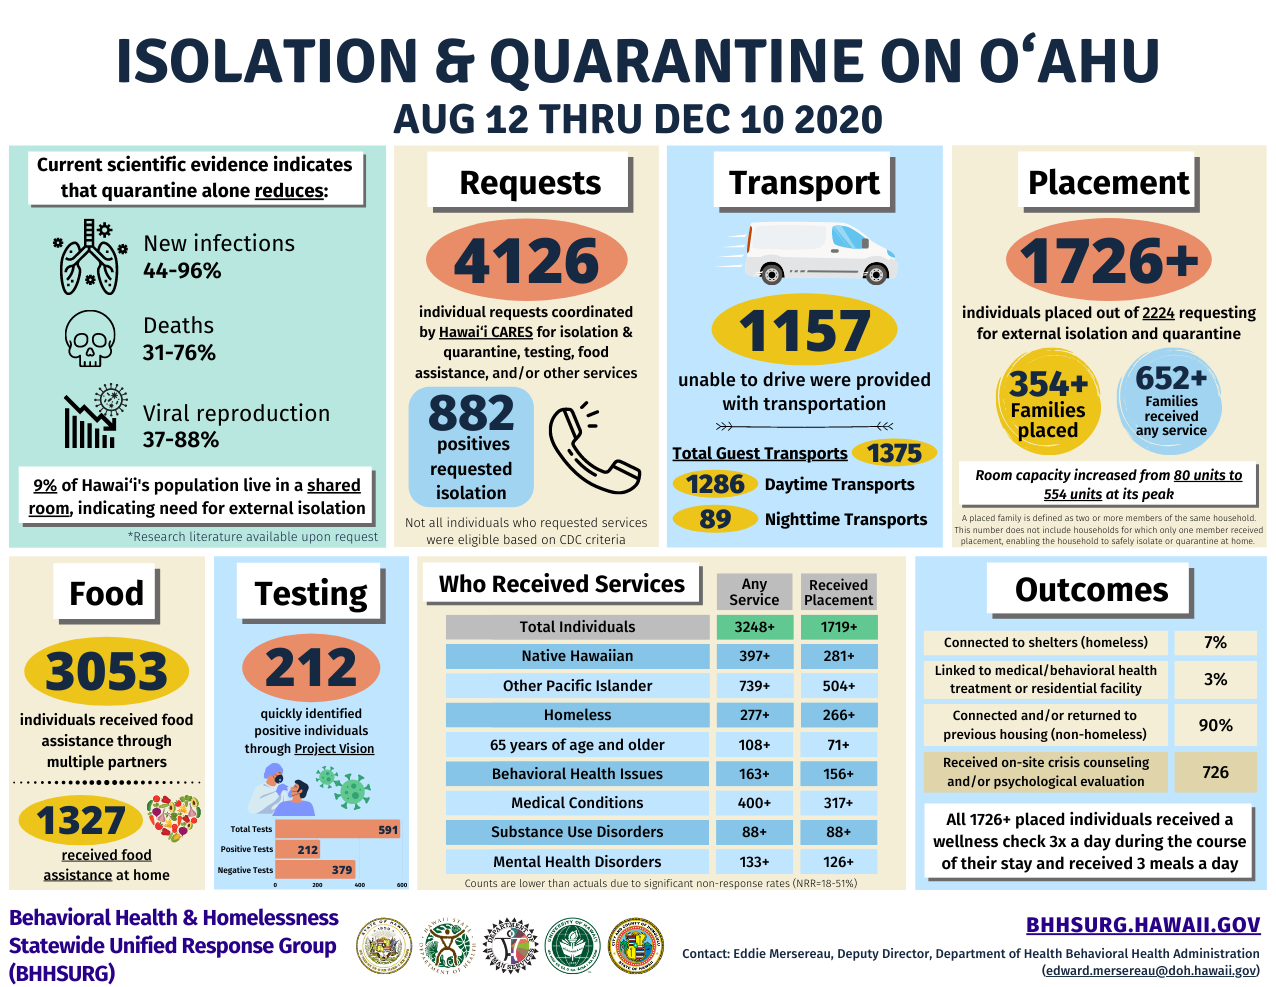 Iso-Quar infographic data page 1 (Aug-Dec 2020 data)